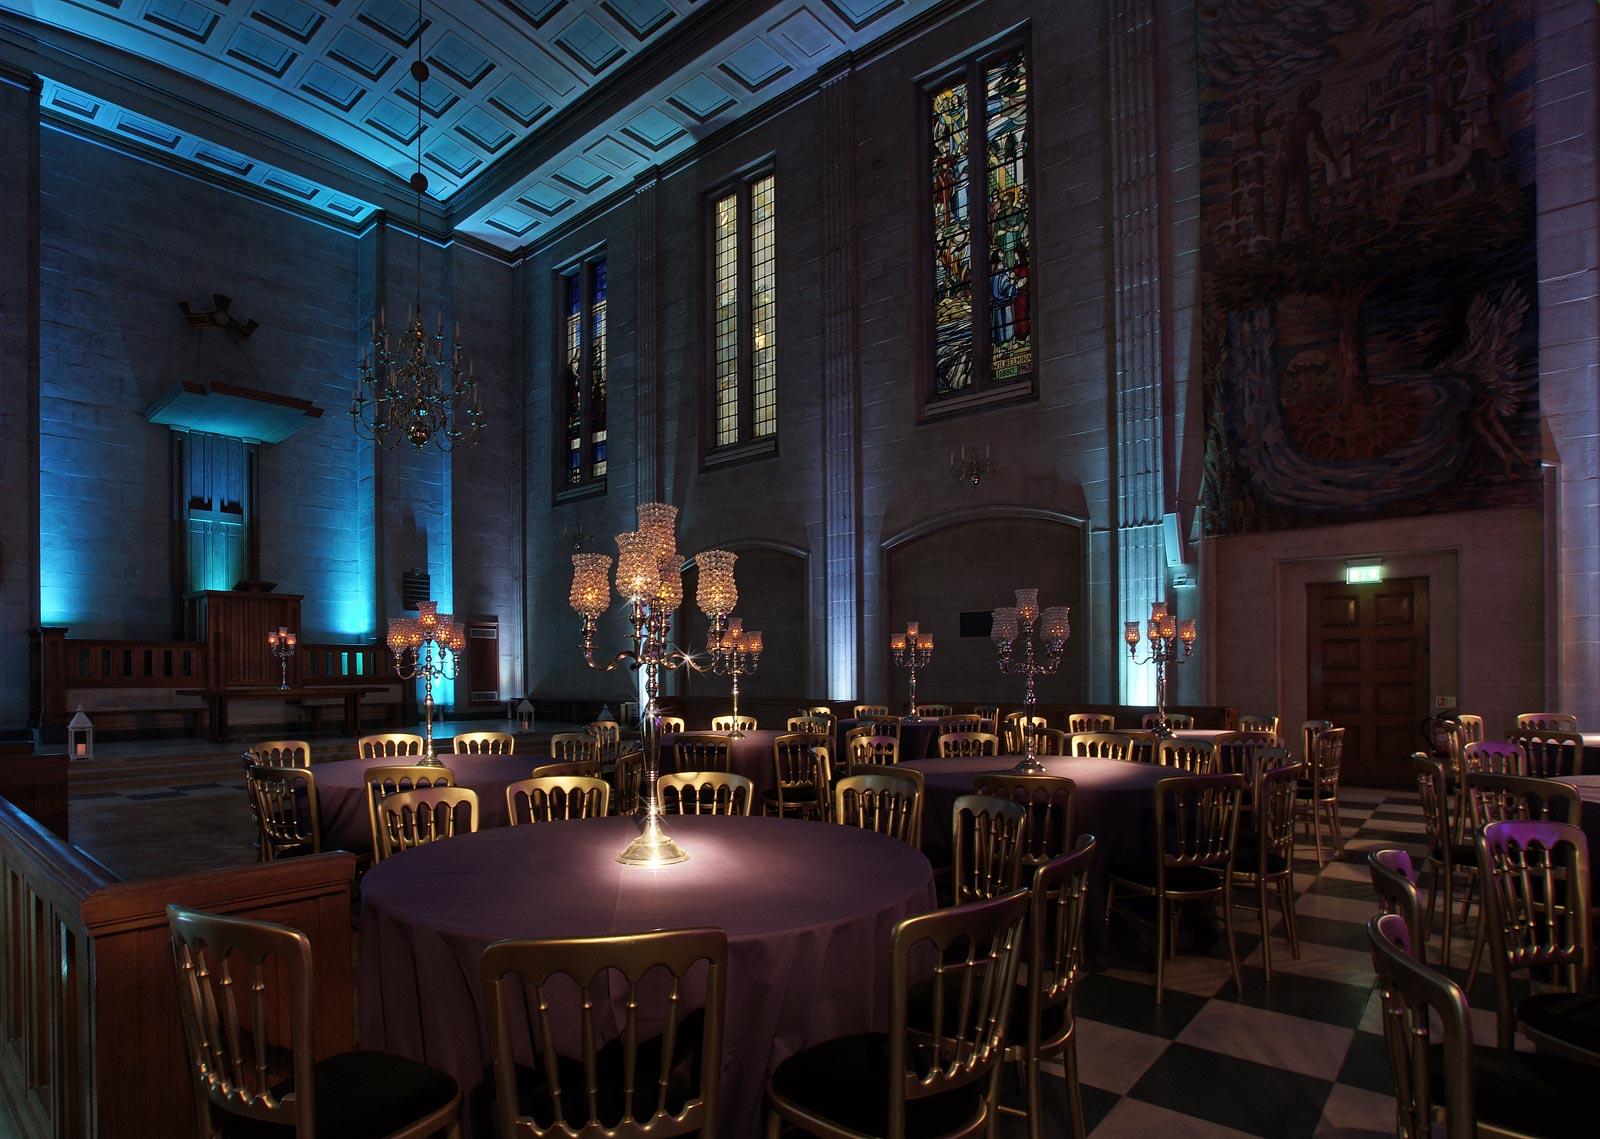 London EC2 event venue The Dutch Hall set for dinner event